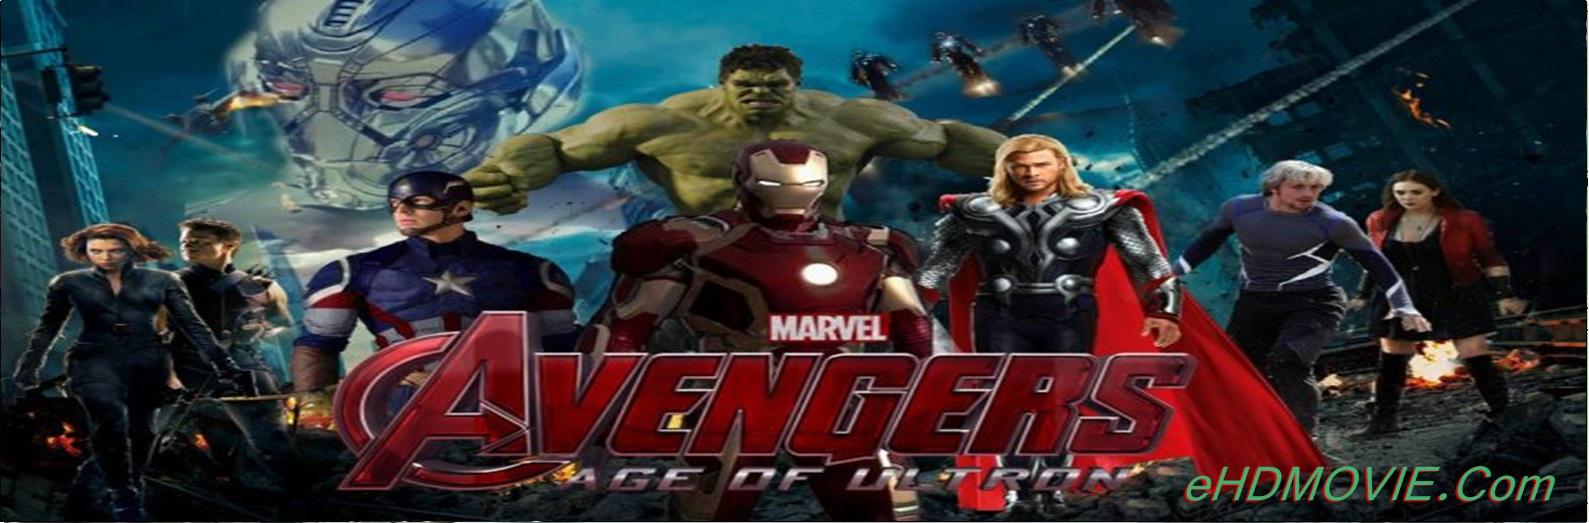 Avengers: Age of Ultron 2015 Full Movie Dual Audio [Hindi – English] 1080p - 720p - 480p ORG BRRip 400MB - 1.1GB - 2.7GB ESubs Free Download